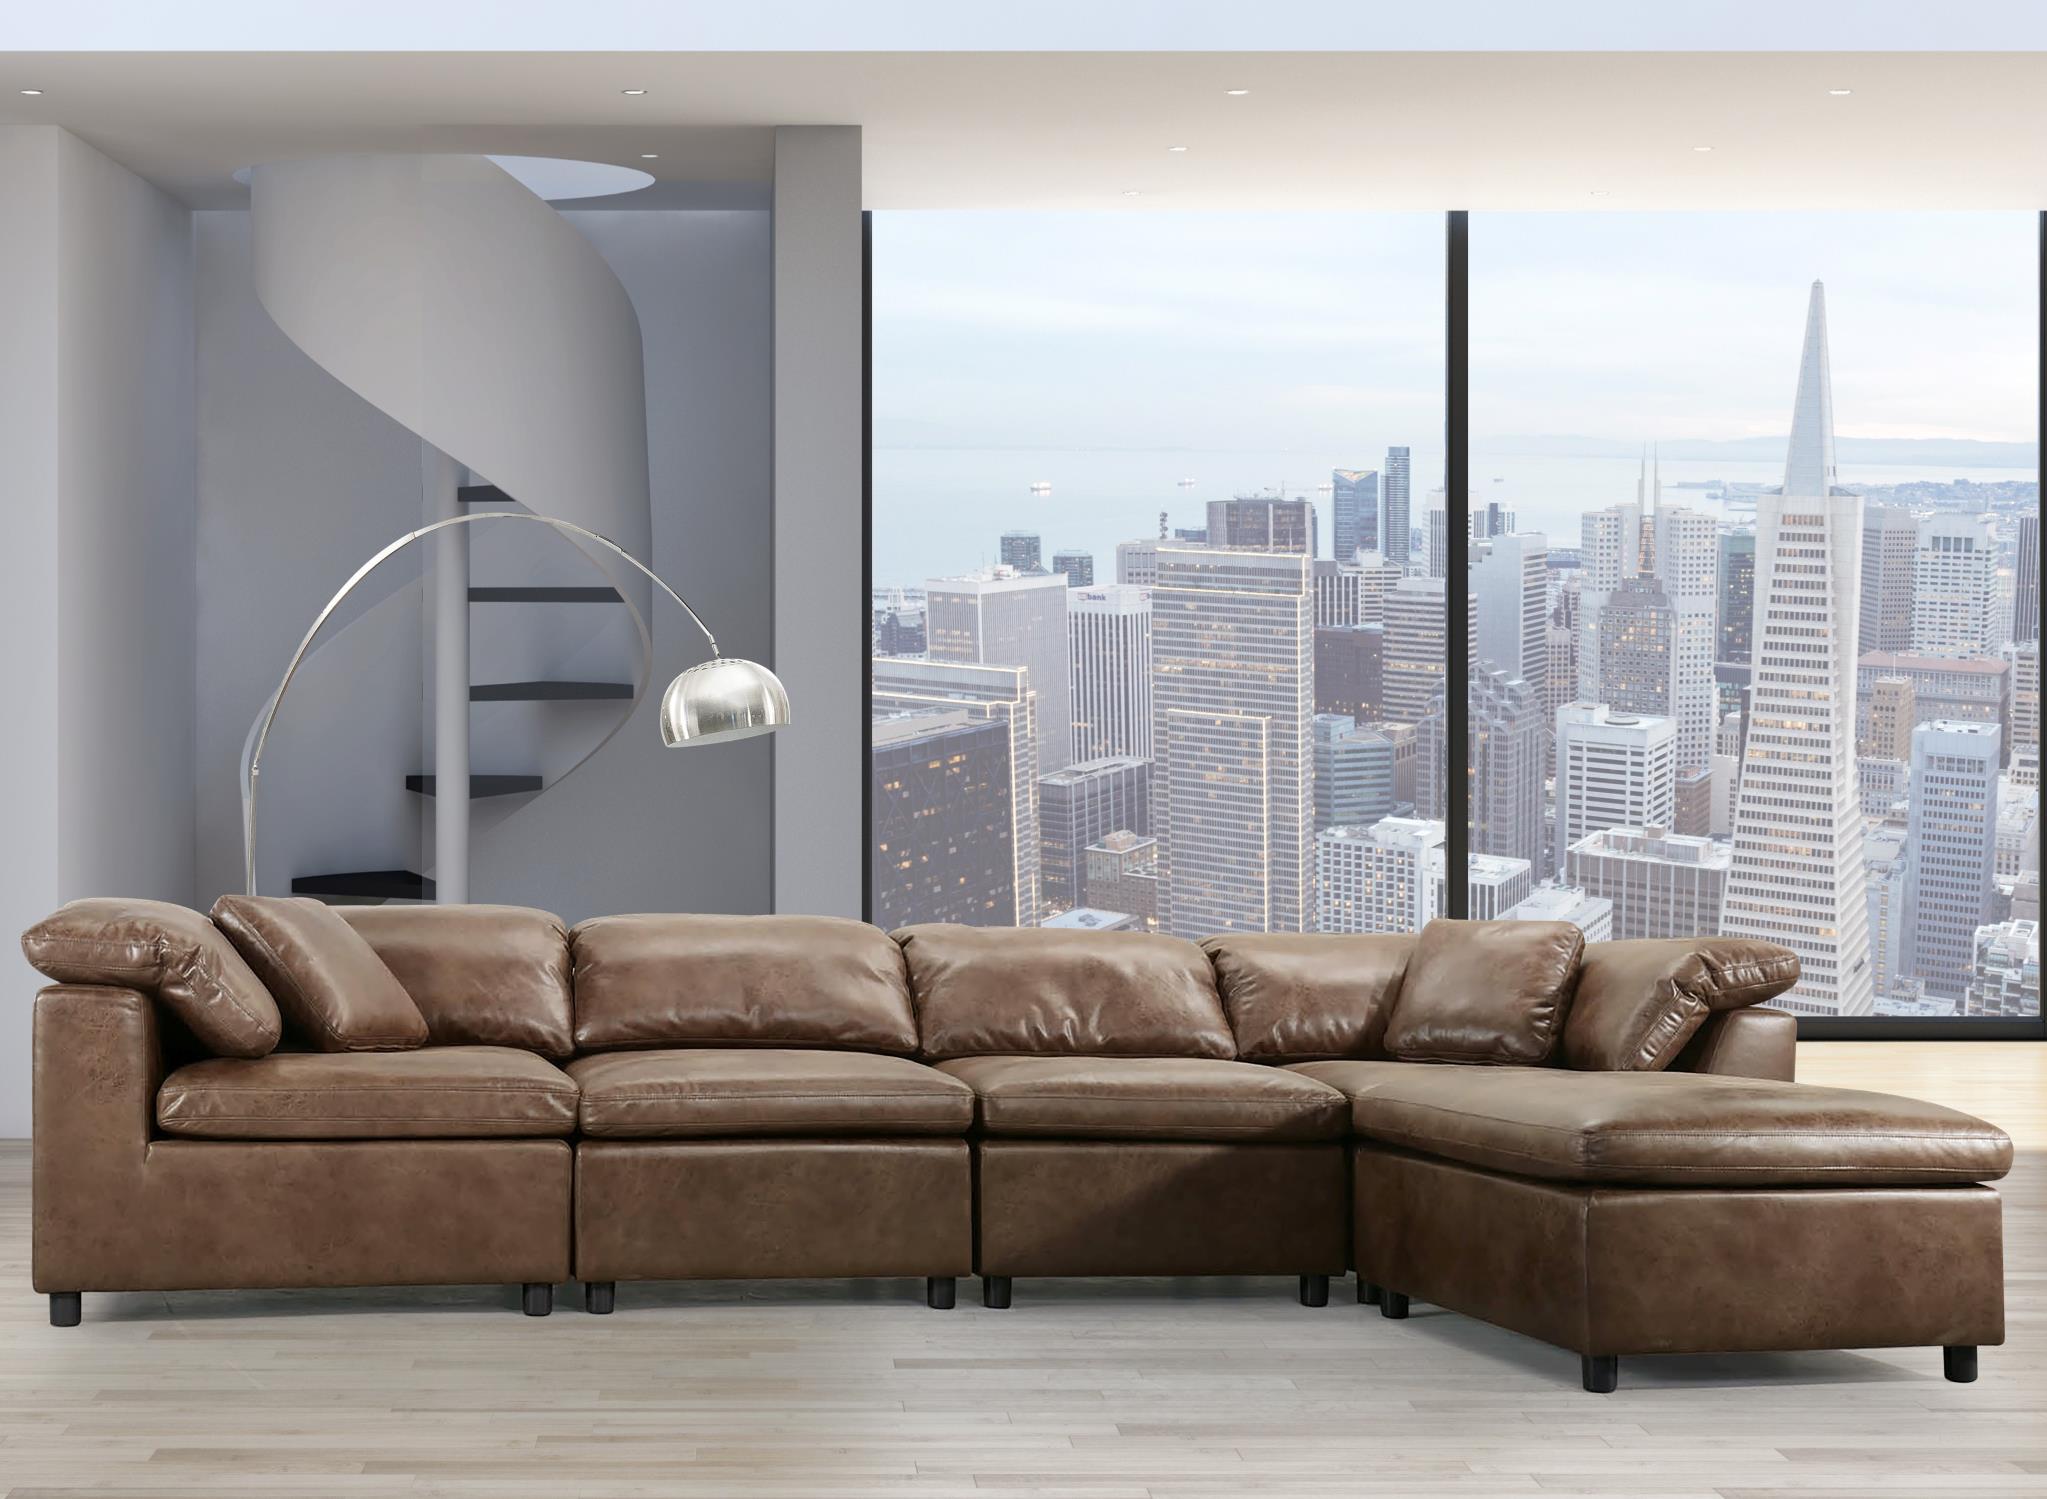 2-Tone Mocha Sectional Sofa